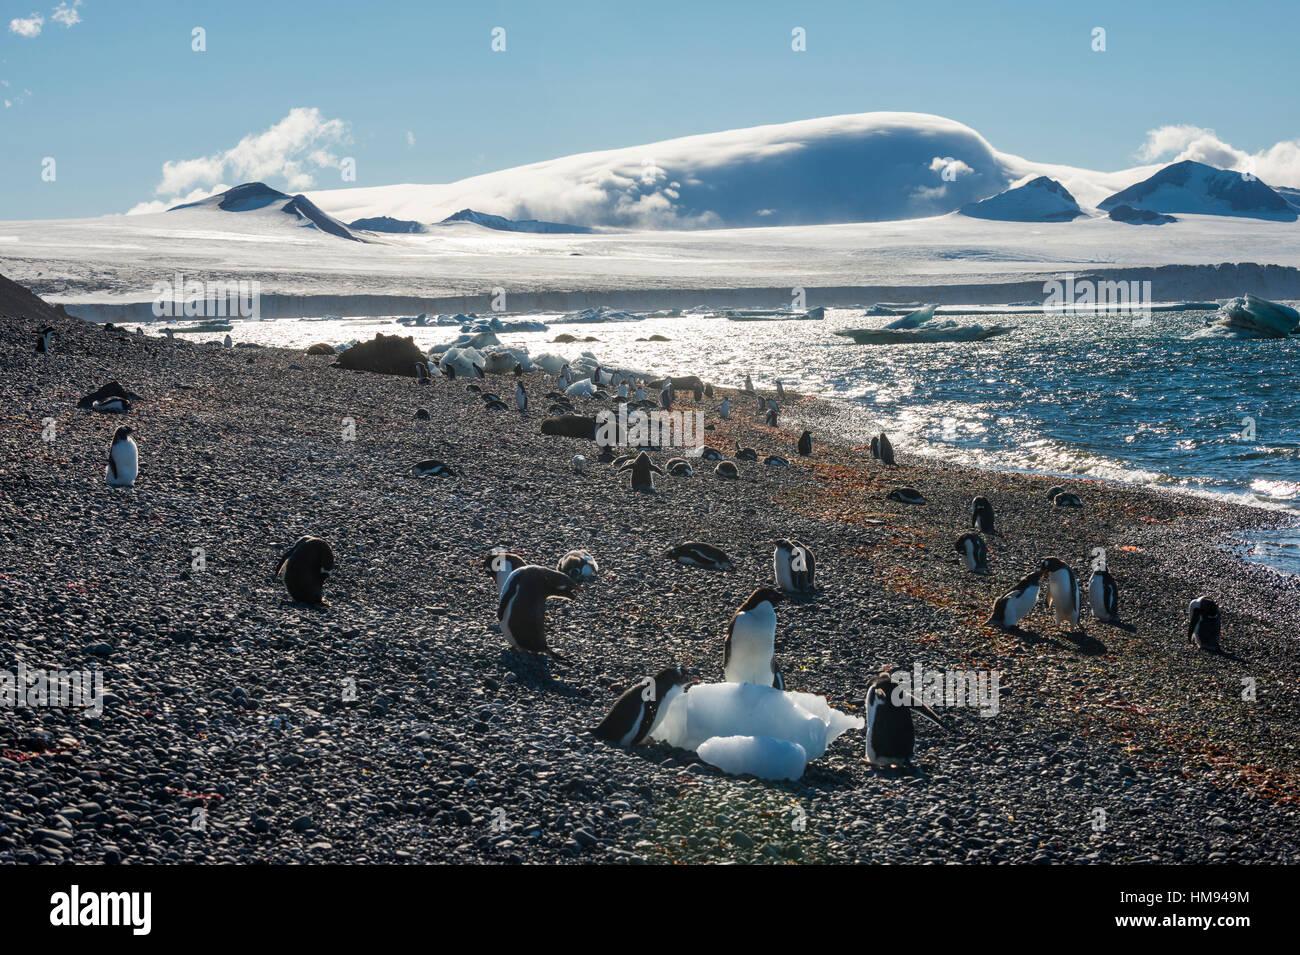 Adelie and gentoo penguins, Brown Bluff, Tabarin Peninsula, Antarctica, Polar Regions - Stock Image